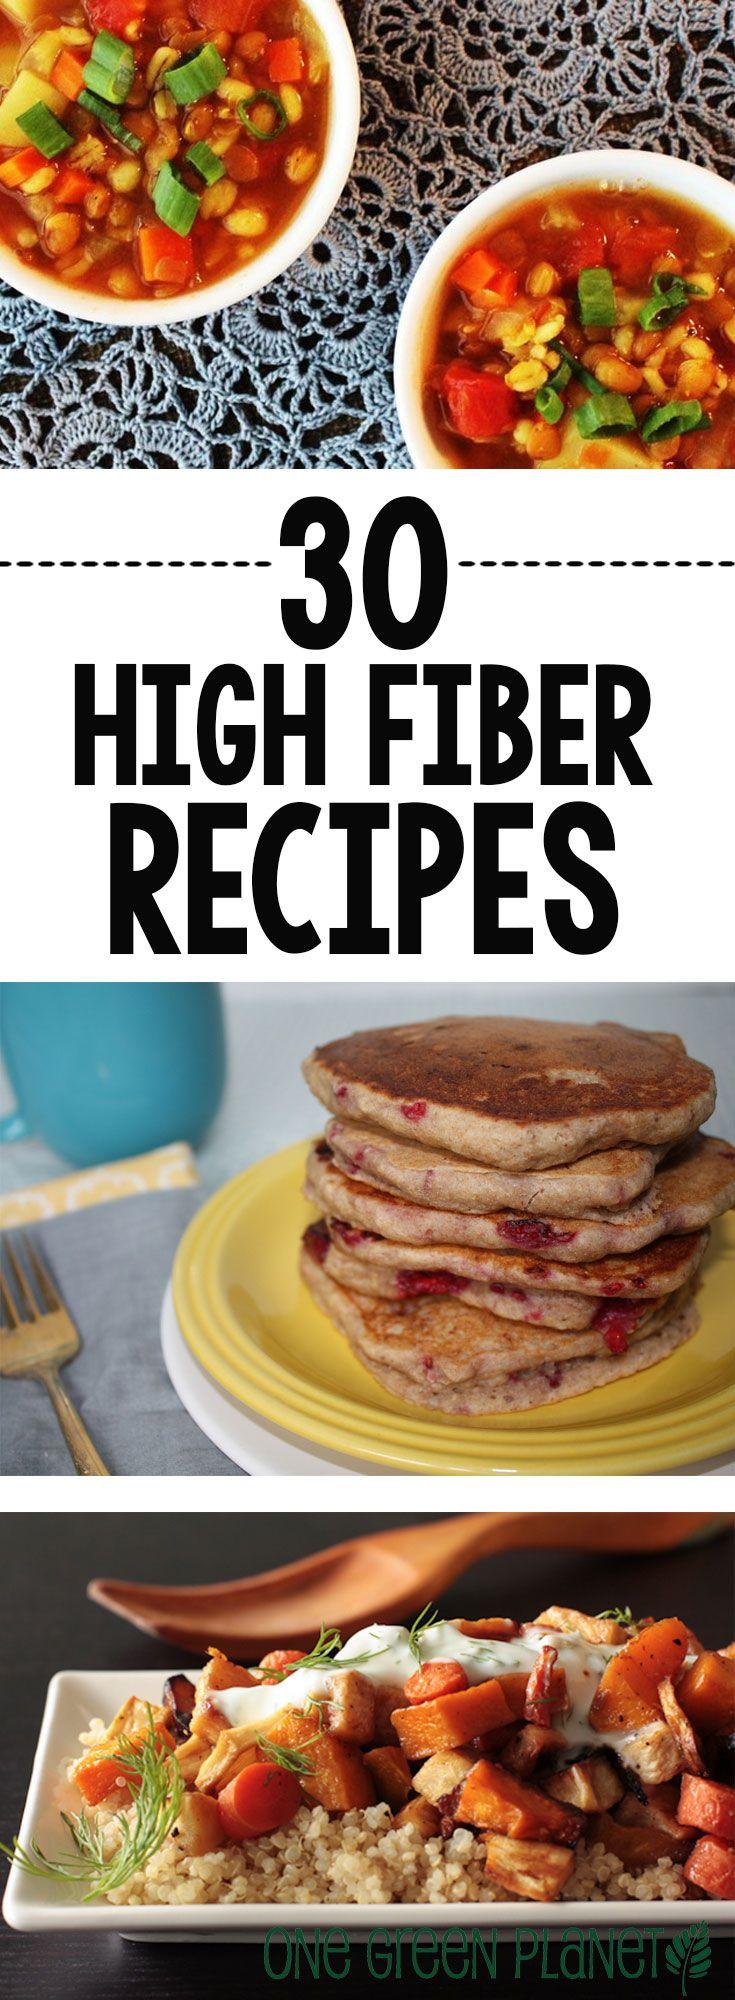 High Fiber Vegetarian Recipes  30 Vegan High Fiber Recipes to Keep Your System Moving